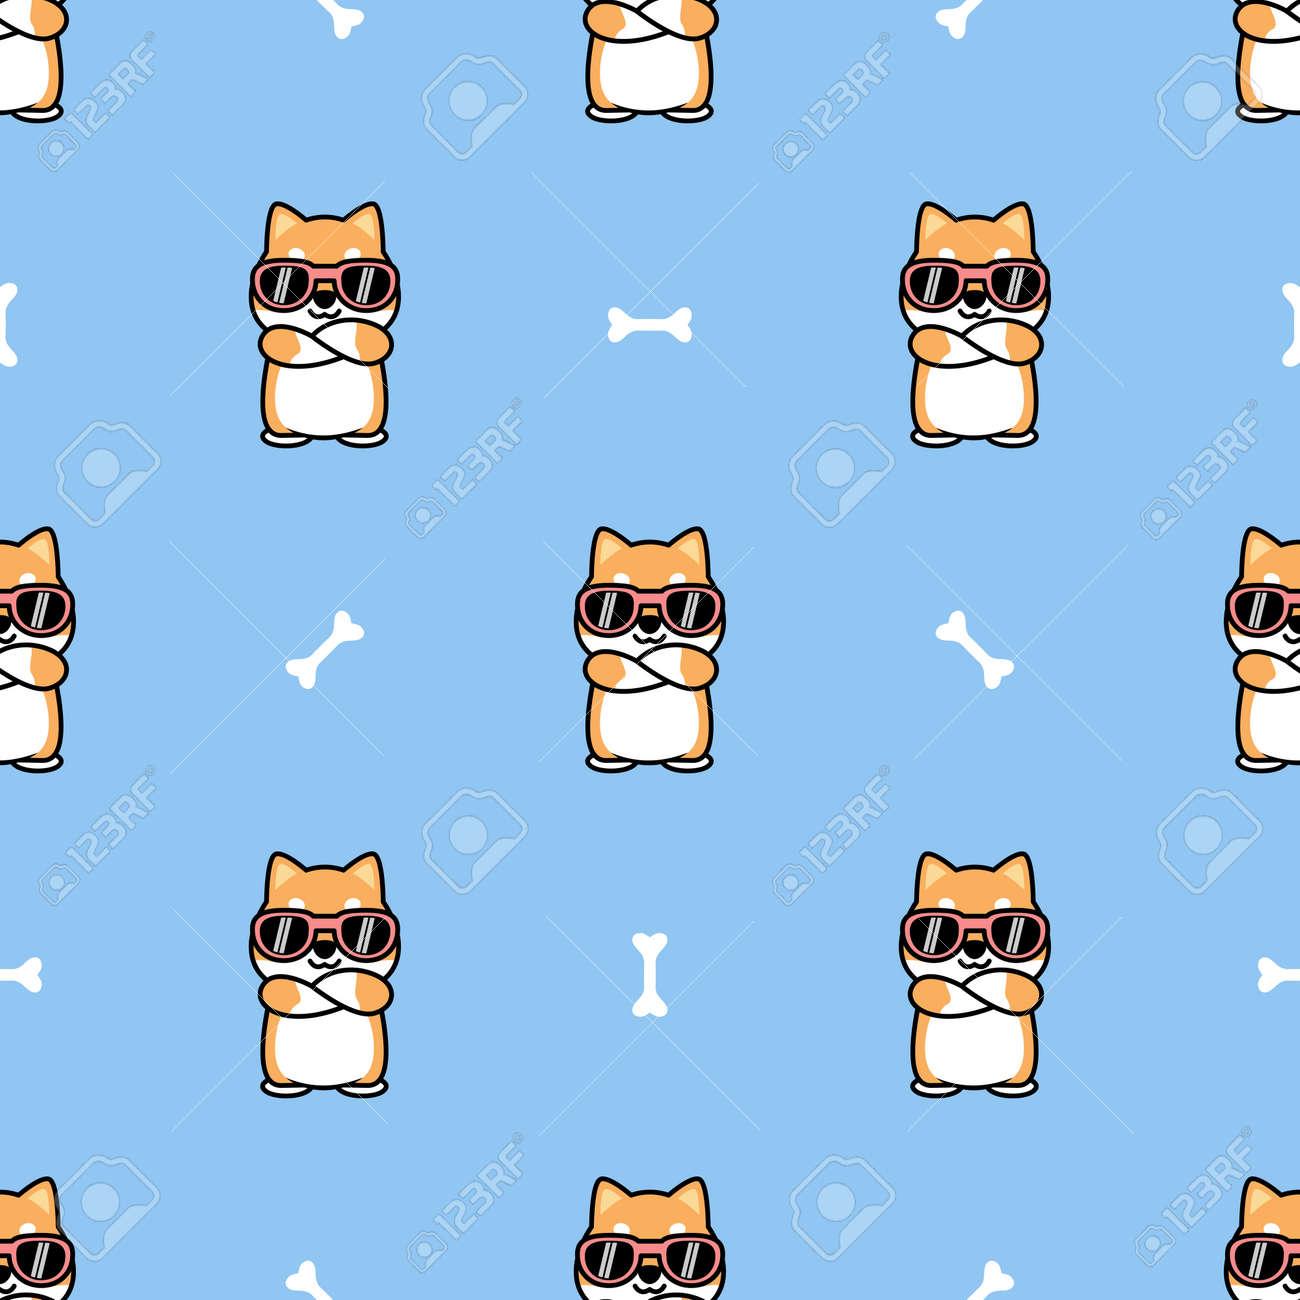 Cute shiba inu dog with sunglasses crossing arms cartoon seamless pattern, vector illustration - 164045052